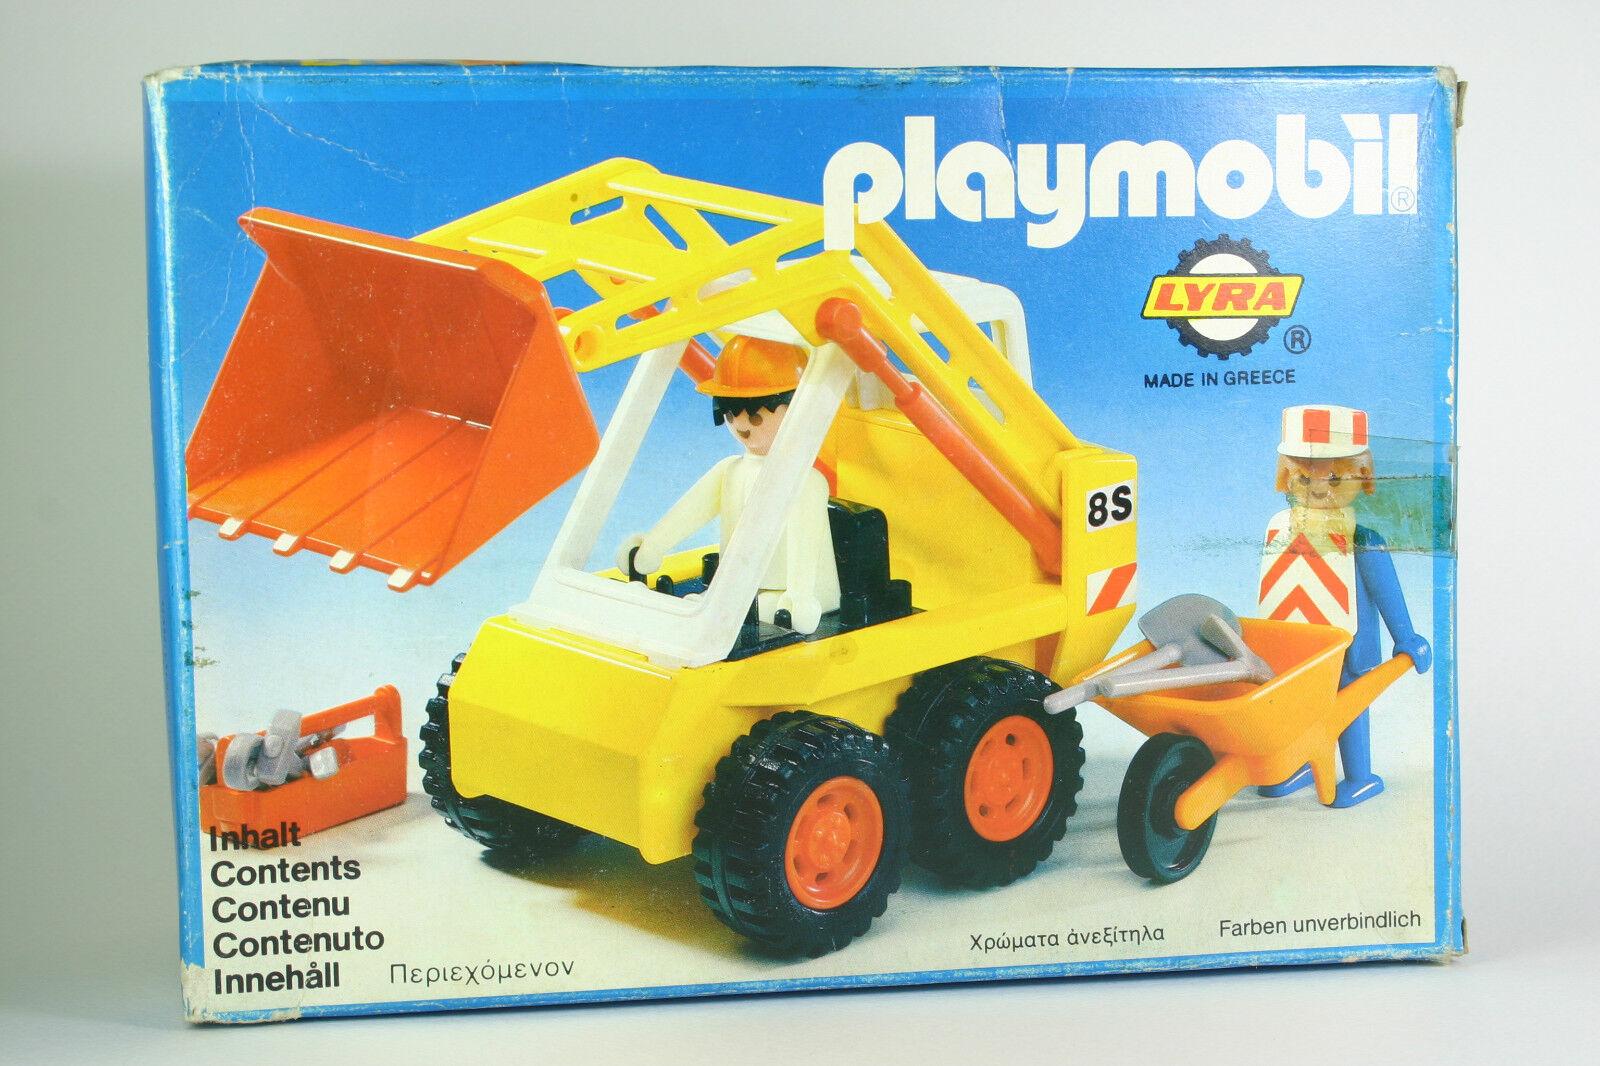 VERY RARE Bulldozer Bulldozer Bulldozer Playmobil Nr 3507 LYRA GREECE 1980 EARTHWORKERS SEALED BAG 7ae889